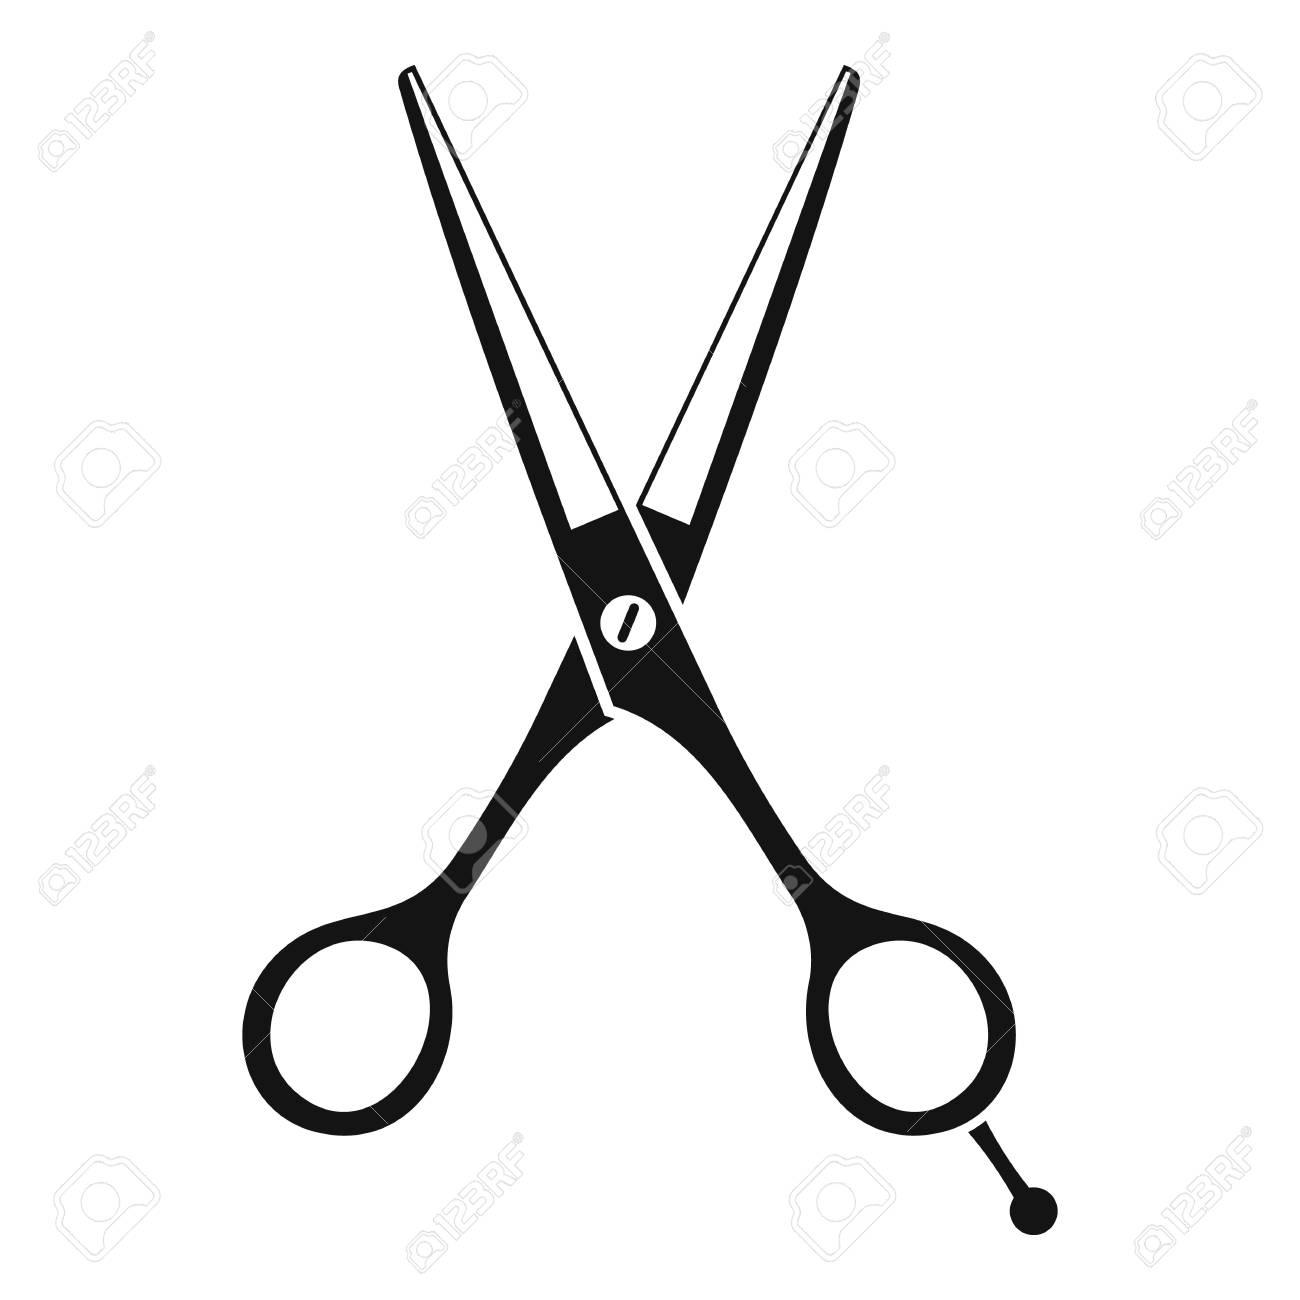 scissors icon simple illustration of scissors vector icon for rh 123rf com scissors vector free scissor vector icon